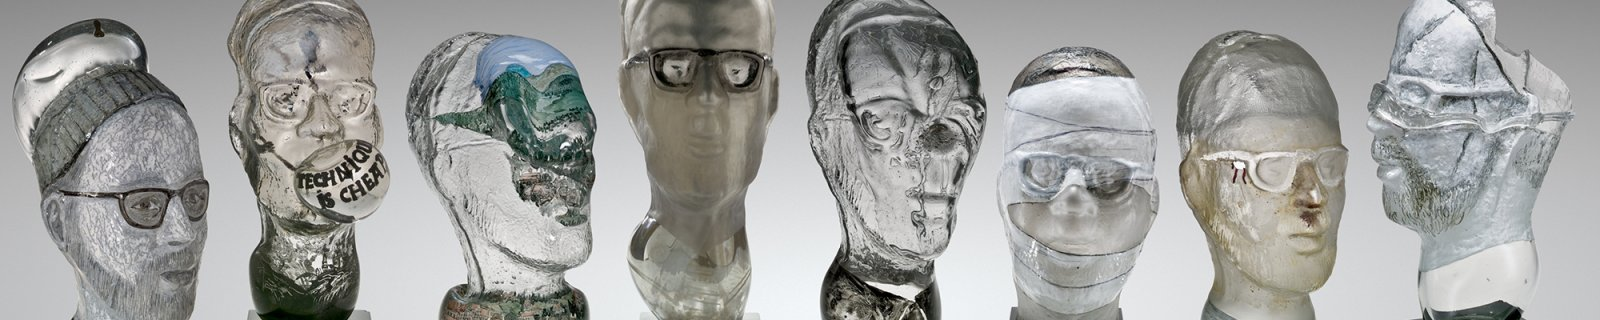 Masters of Studio Glass: Erwin Eisch